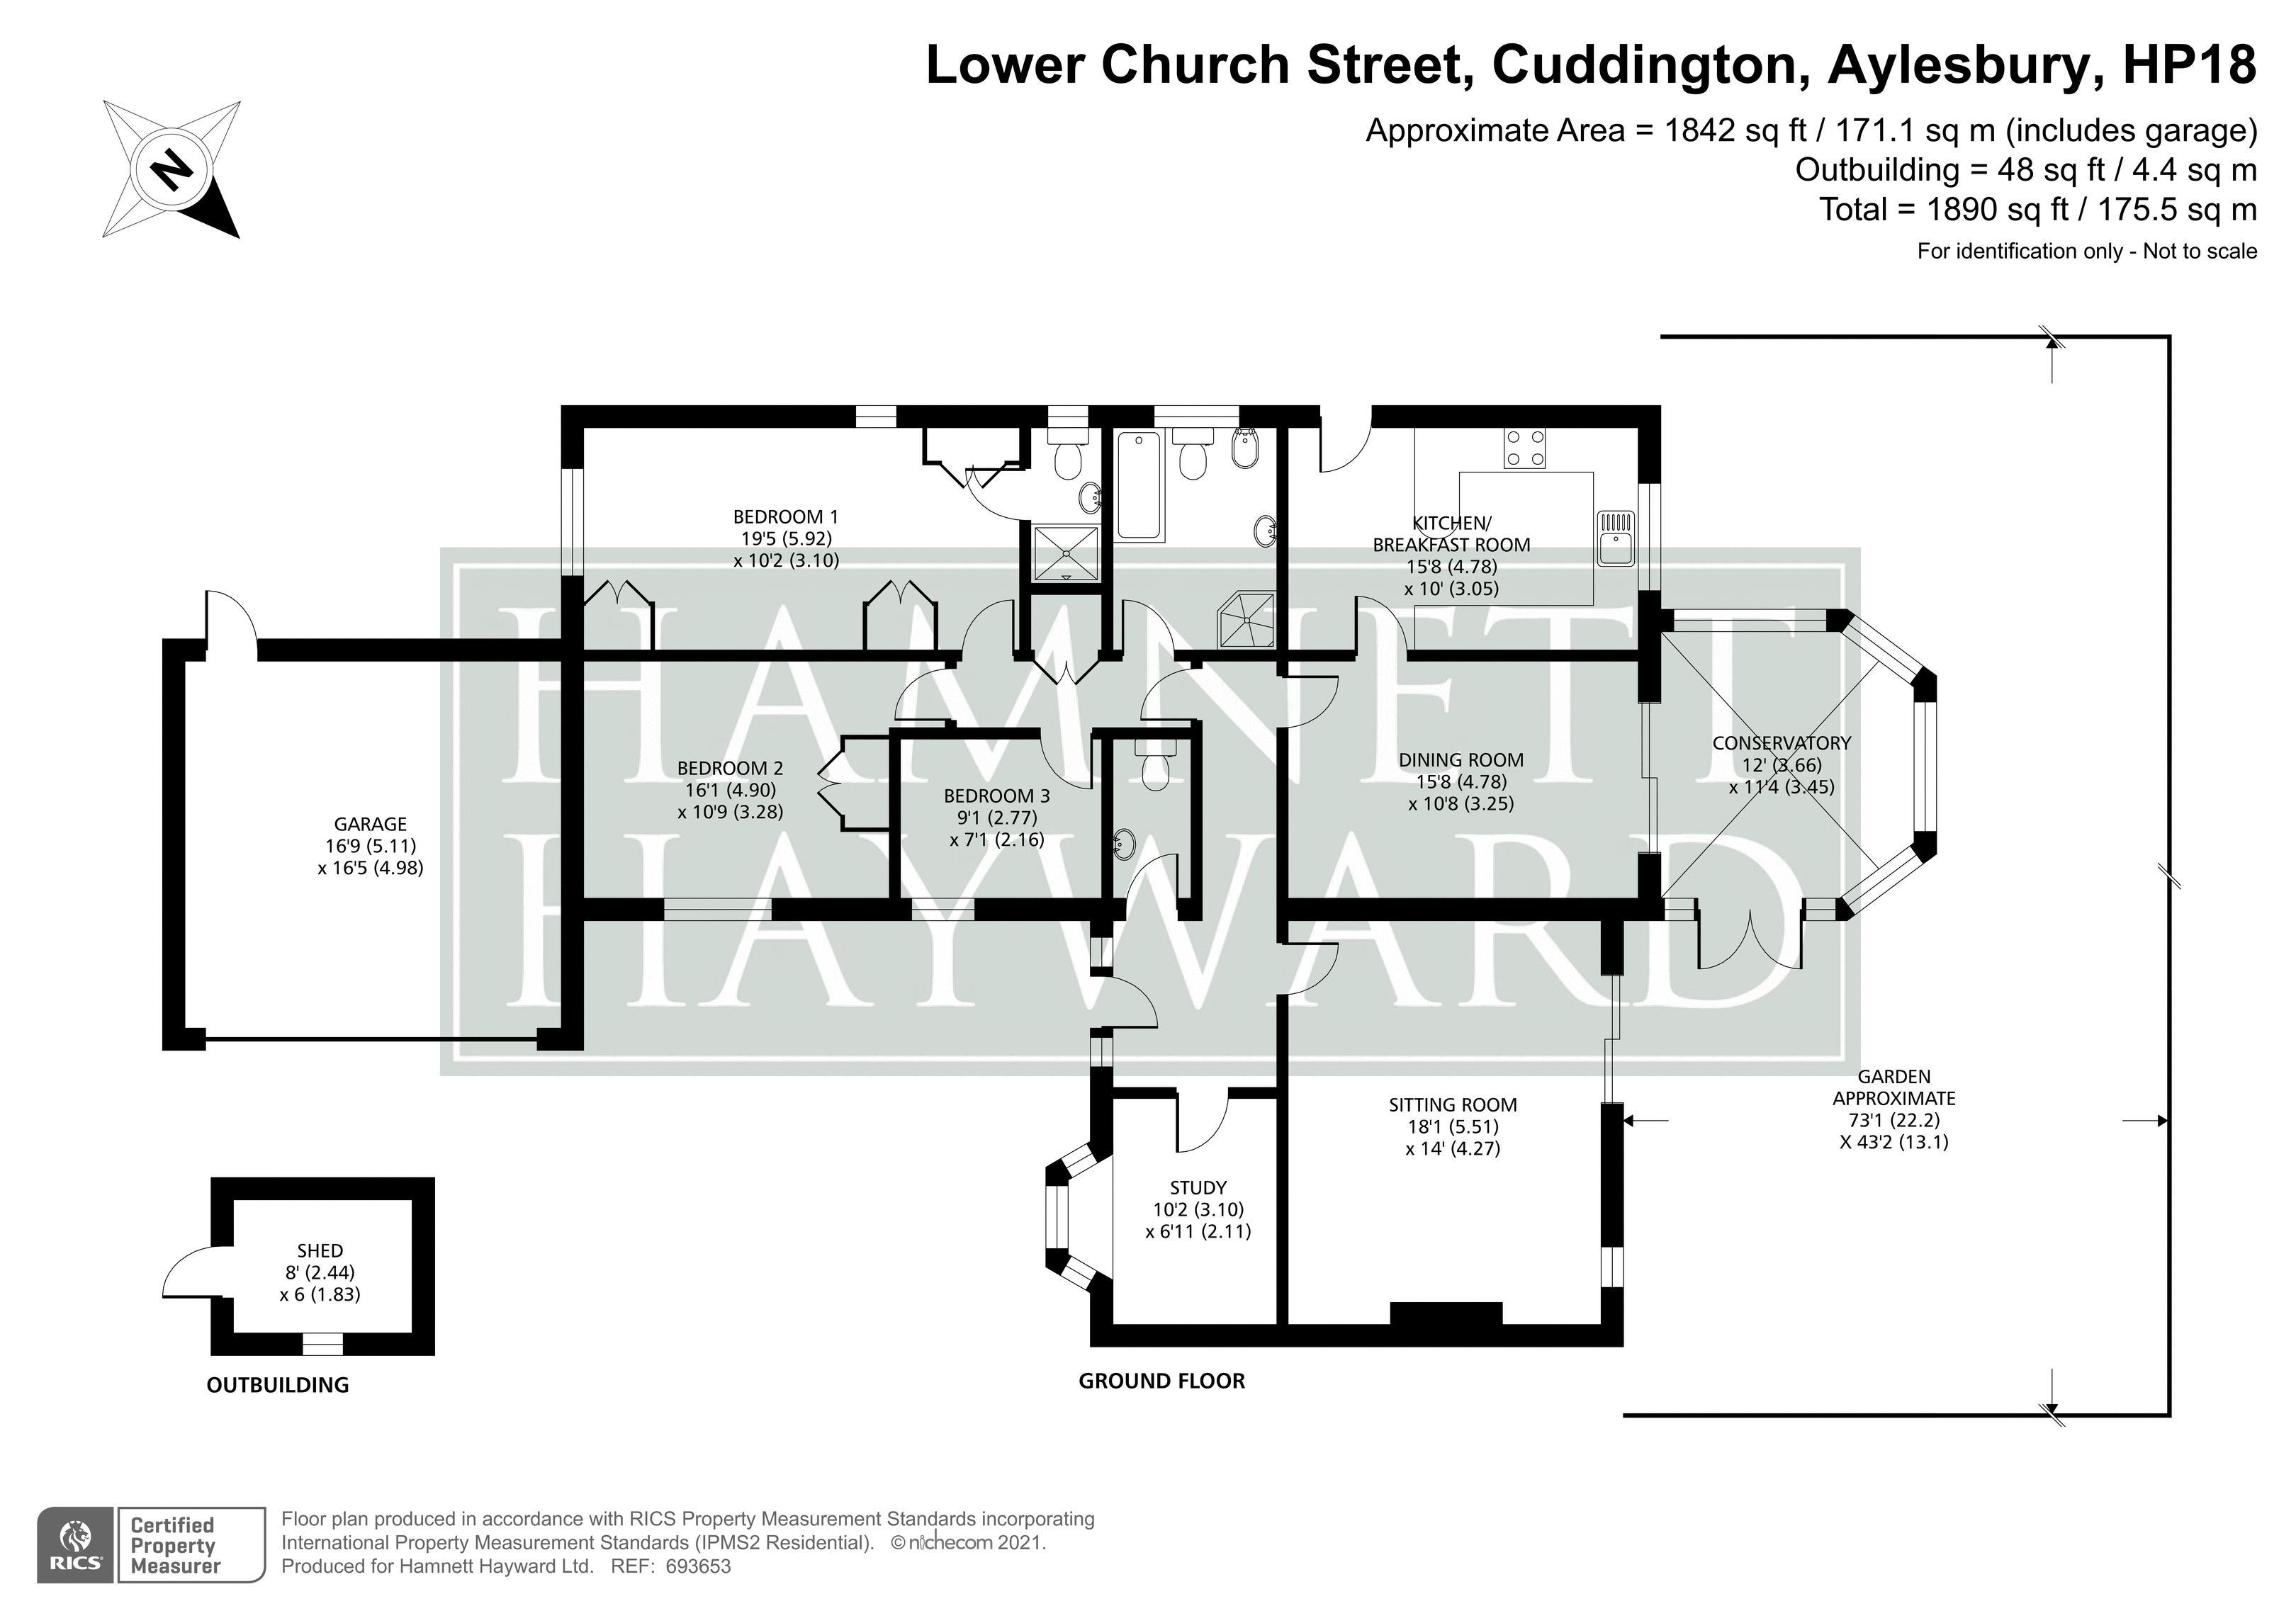 Lower Church Street Cuddington